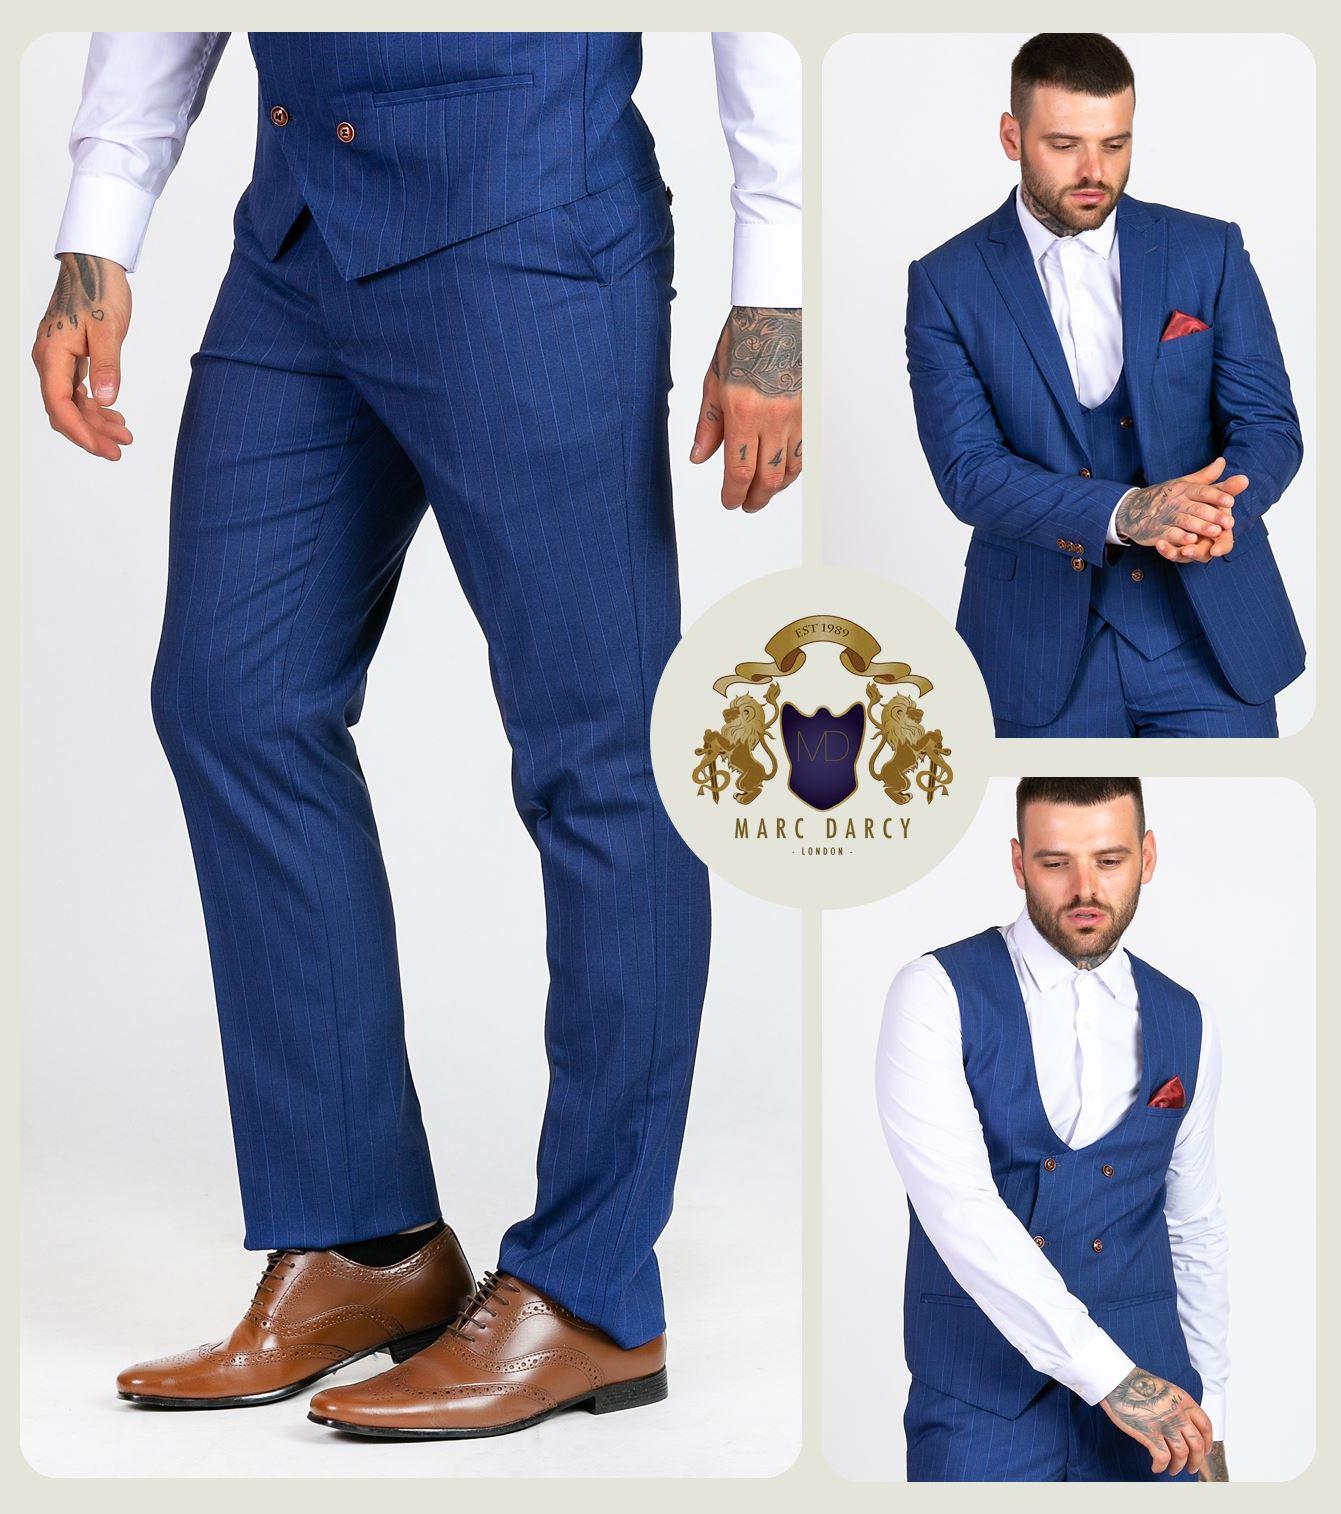 Mens Marc Darcy Pinstripe Trousers Slim Fit Formal Work Business Wedding Pants